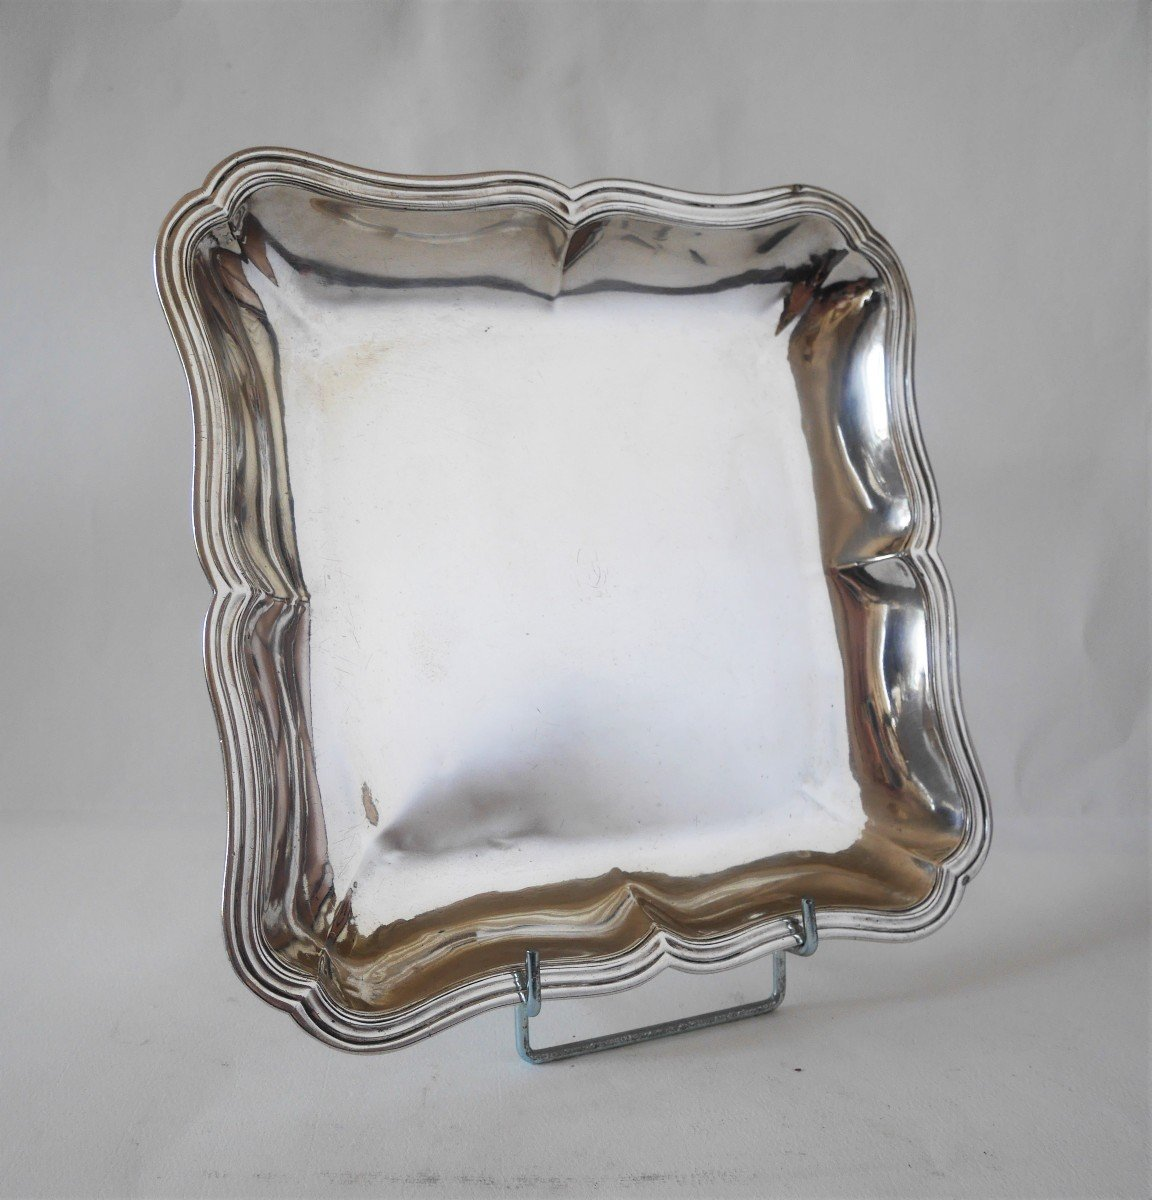 Dish, Sterling Silver By Jean-antoine Bourguet, Paris, 1760-1761-photo-2